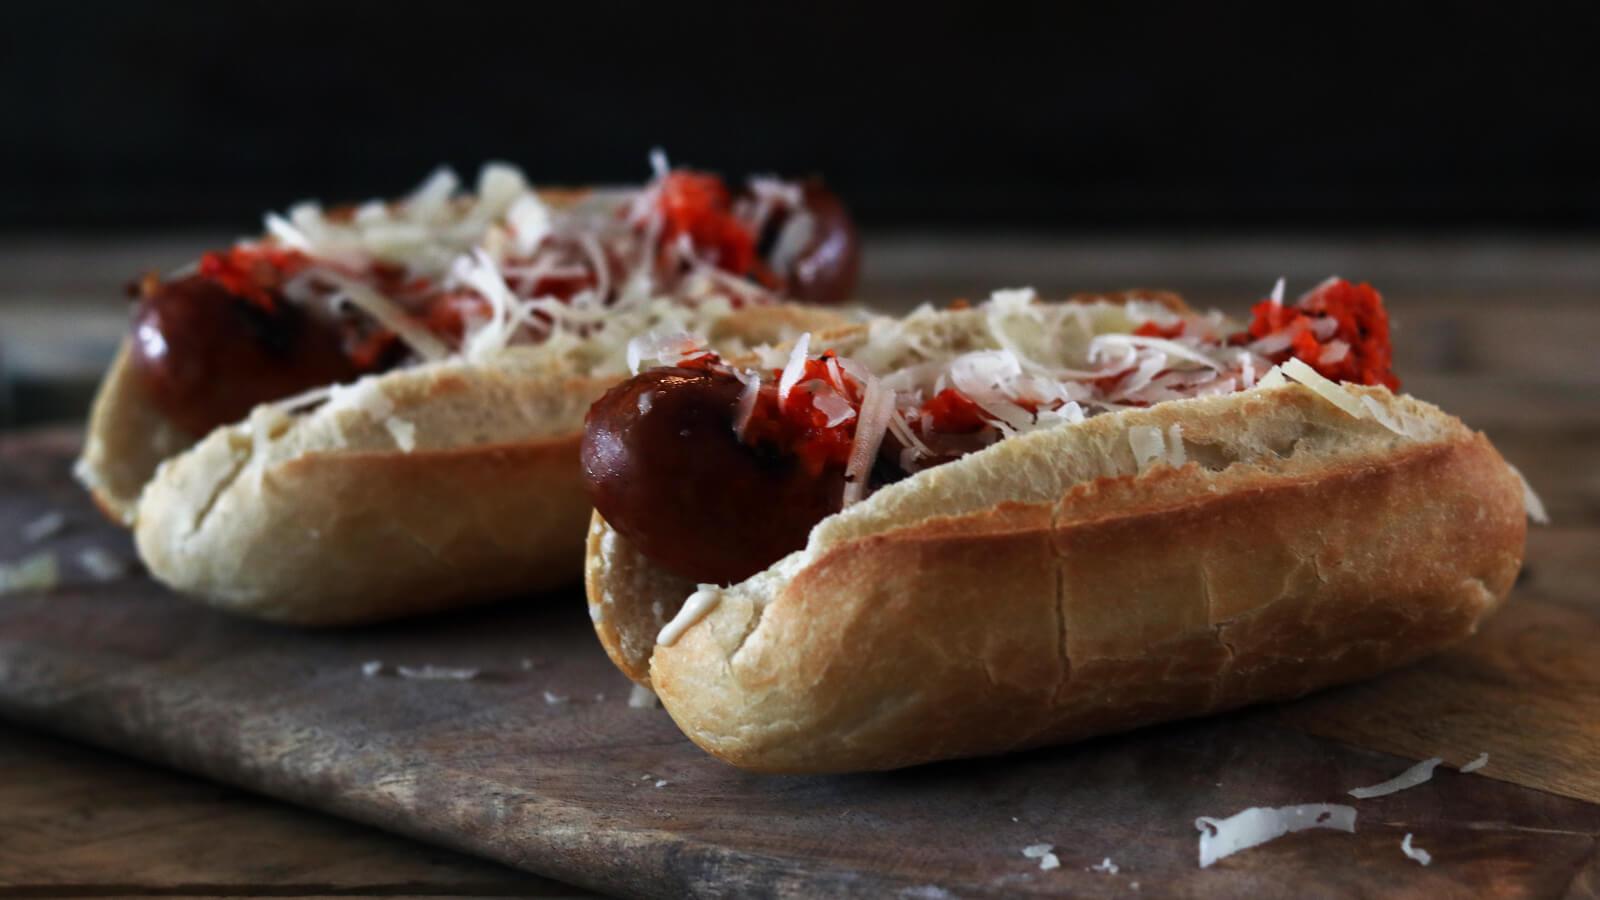 Spaanse Hotdogs met Merguez van Ree